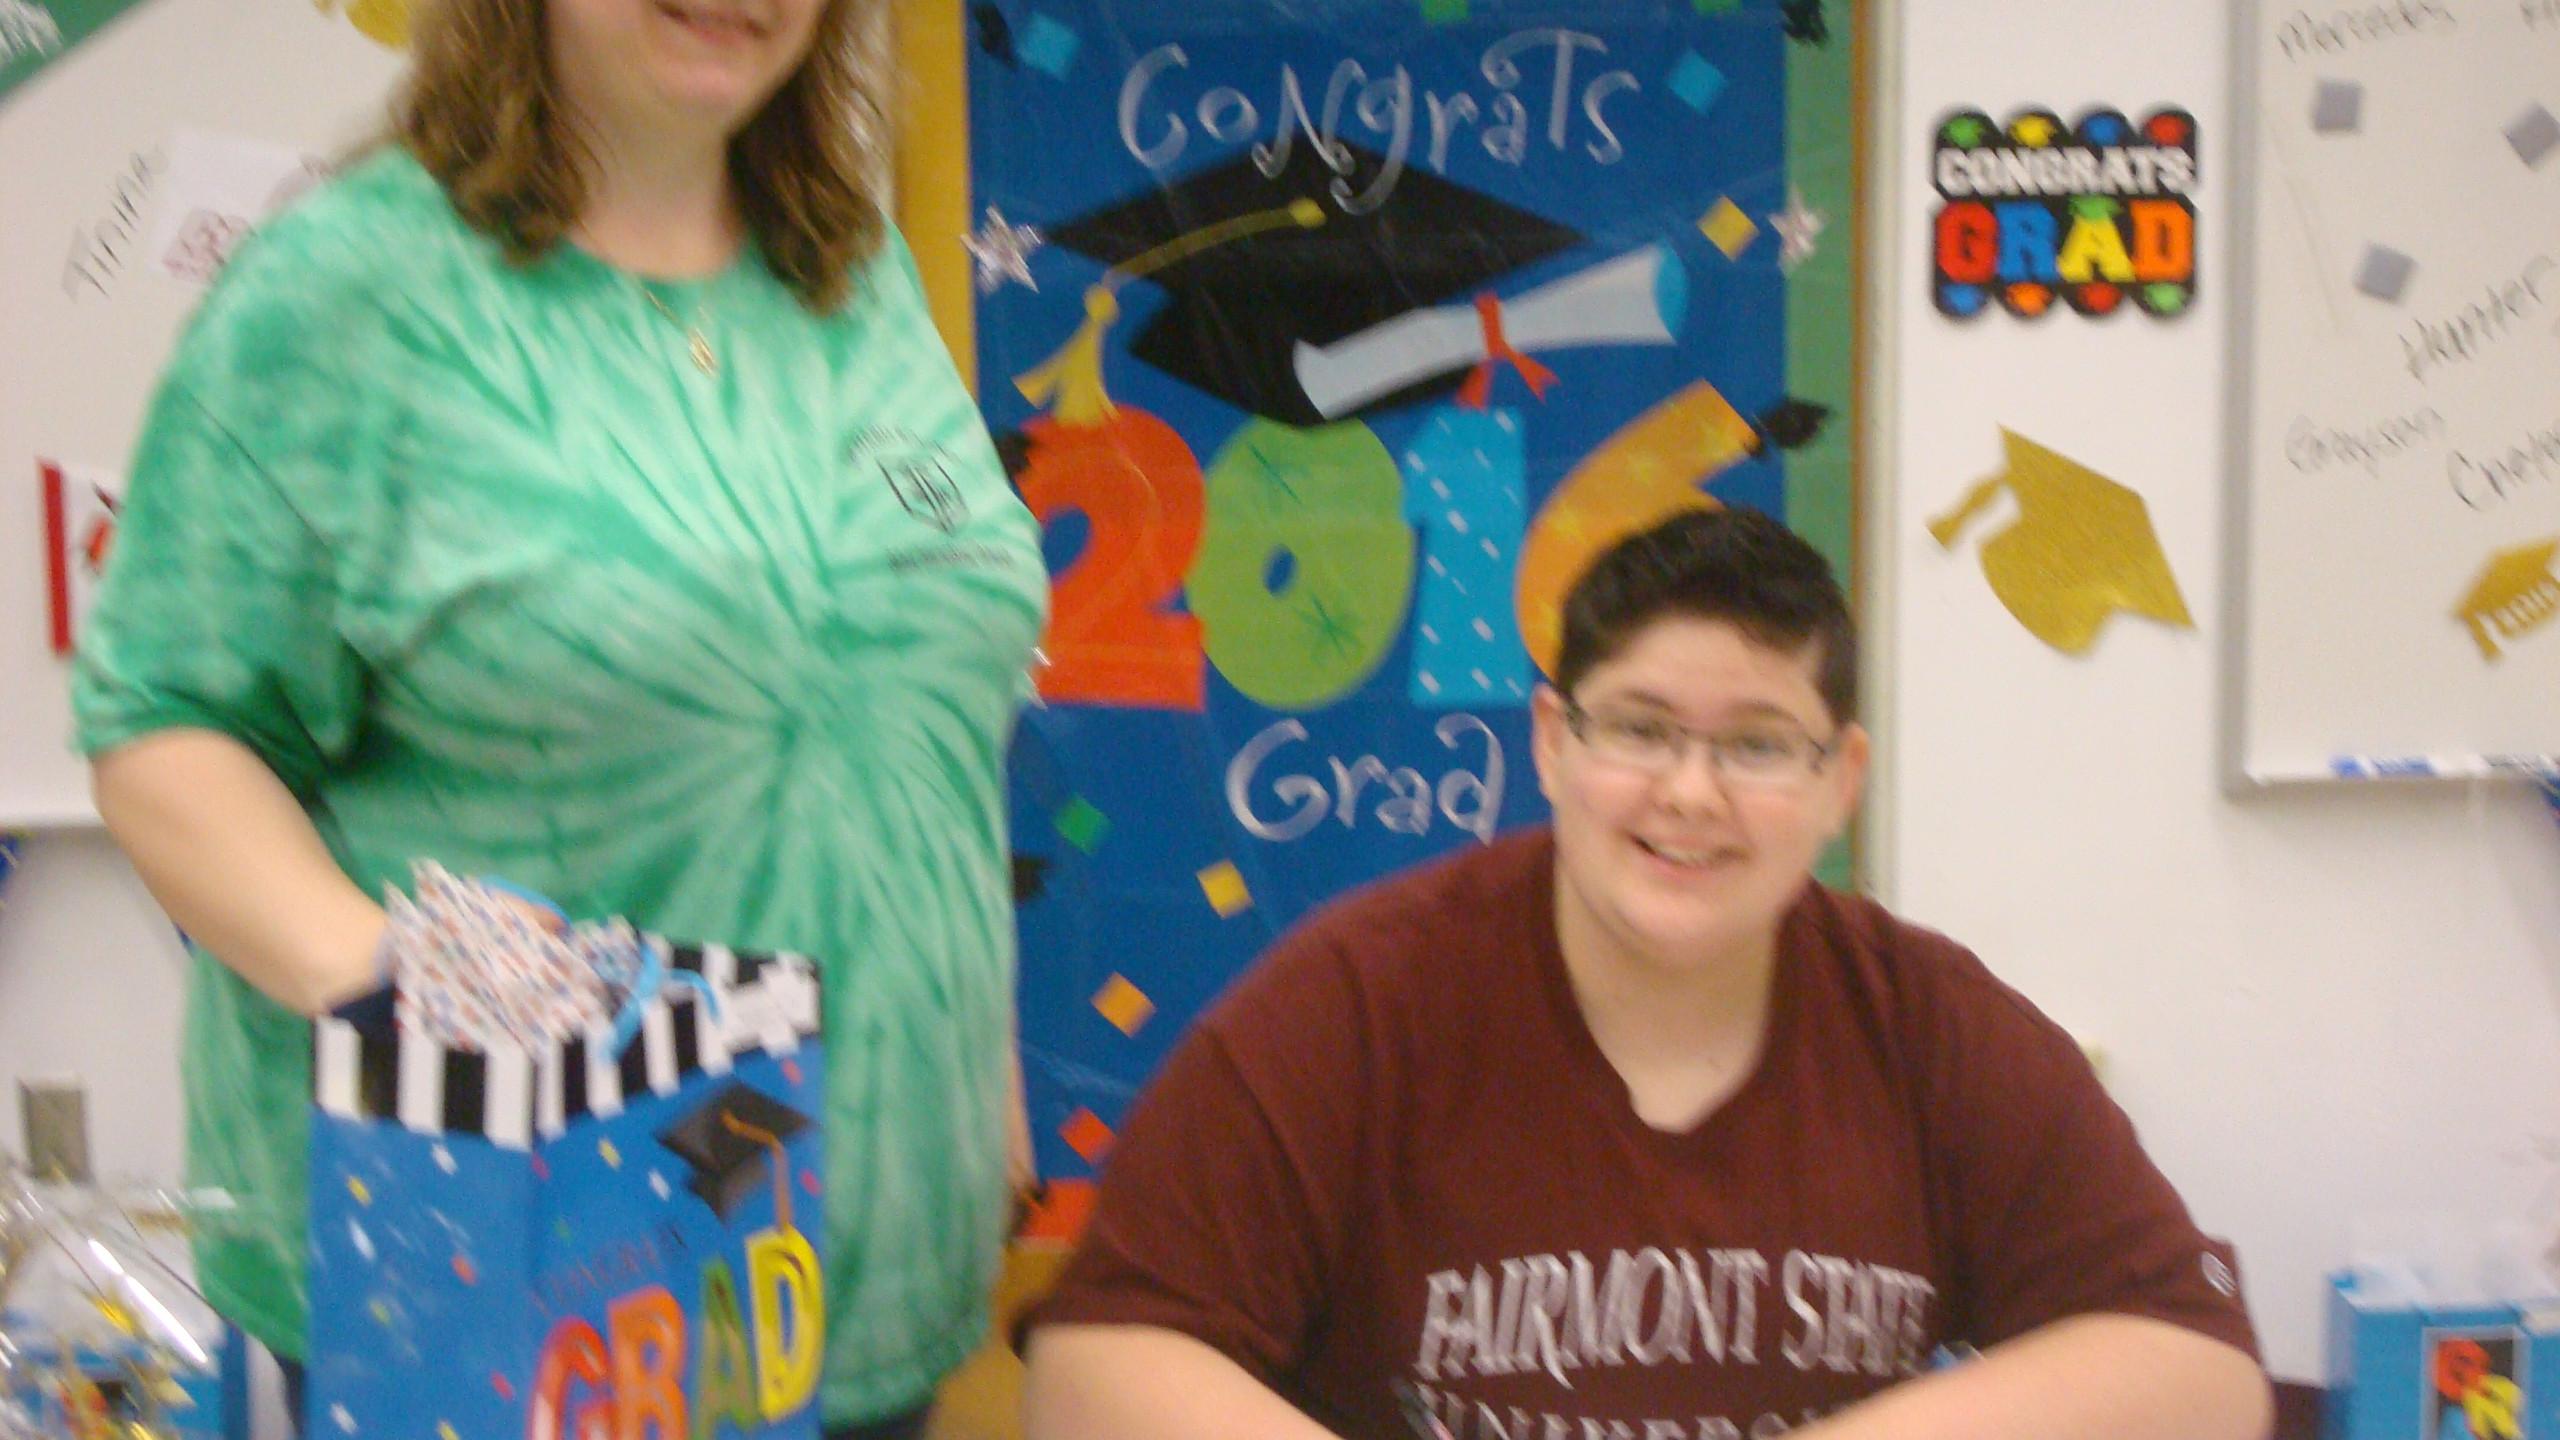 Grayson plans to attend Fairmont State University